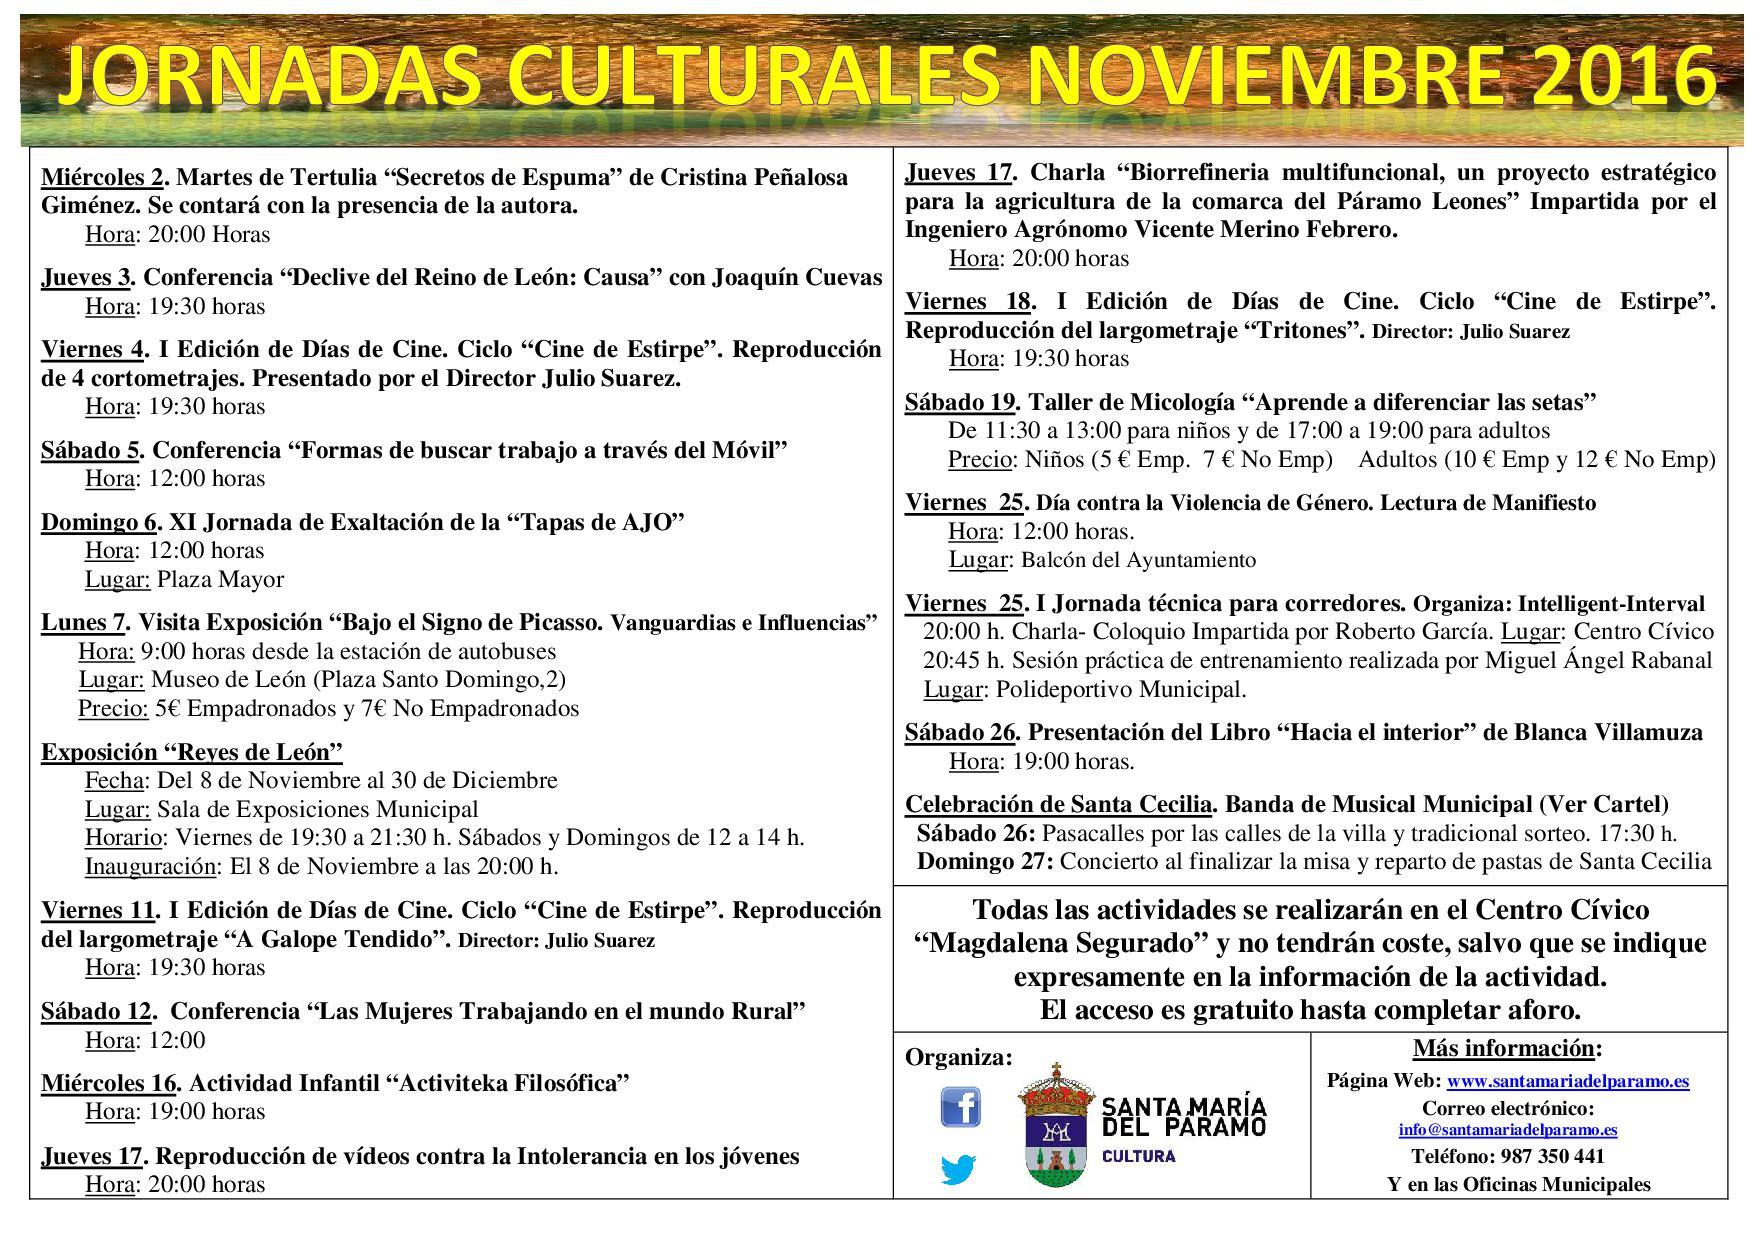 cartel-jornadas-culturales-otoo-2016-noviembre-definitivo